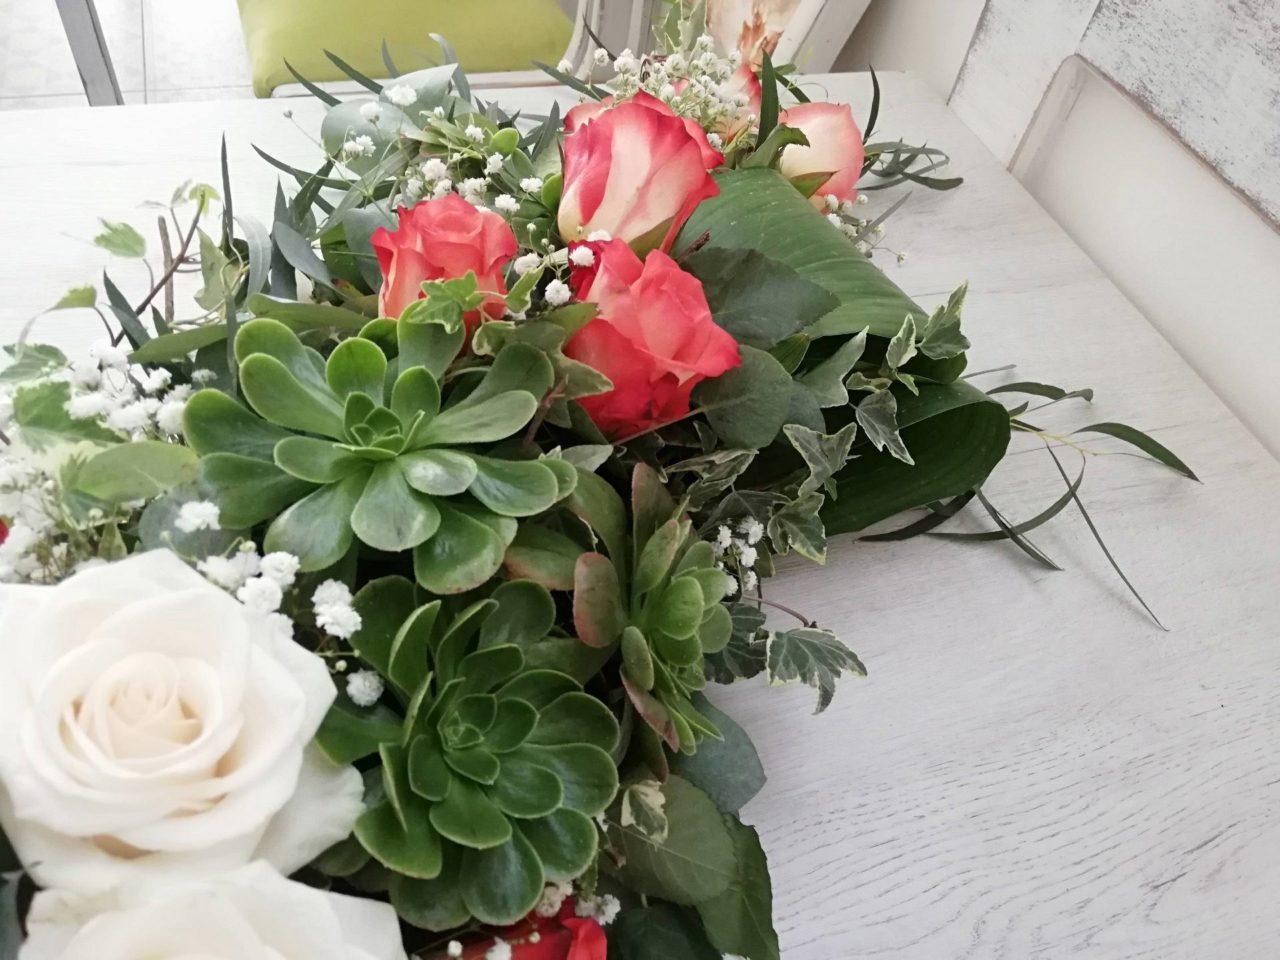 Flores bienvenida hogar